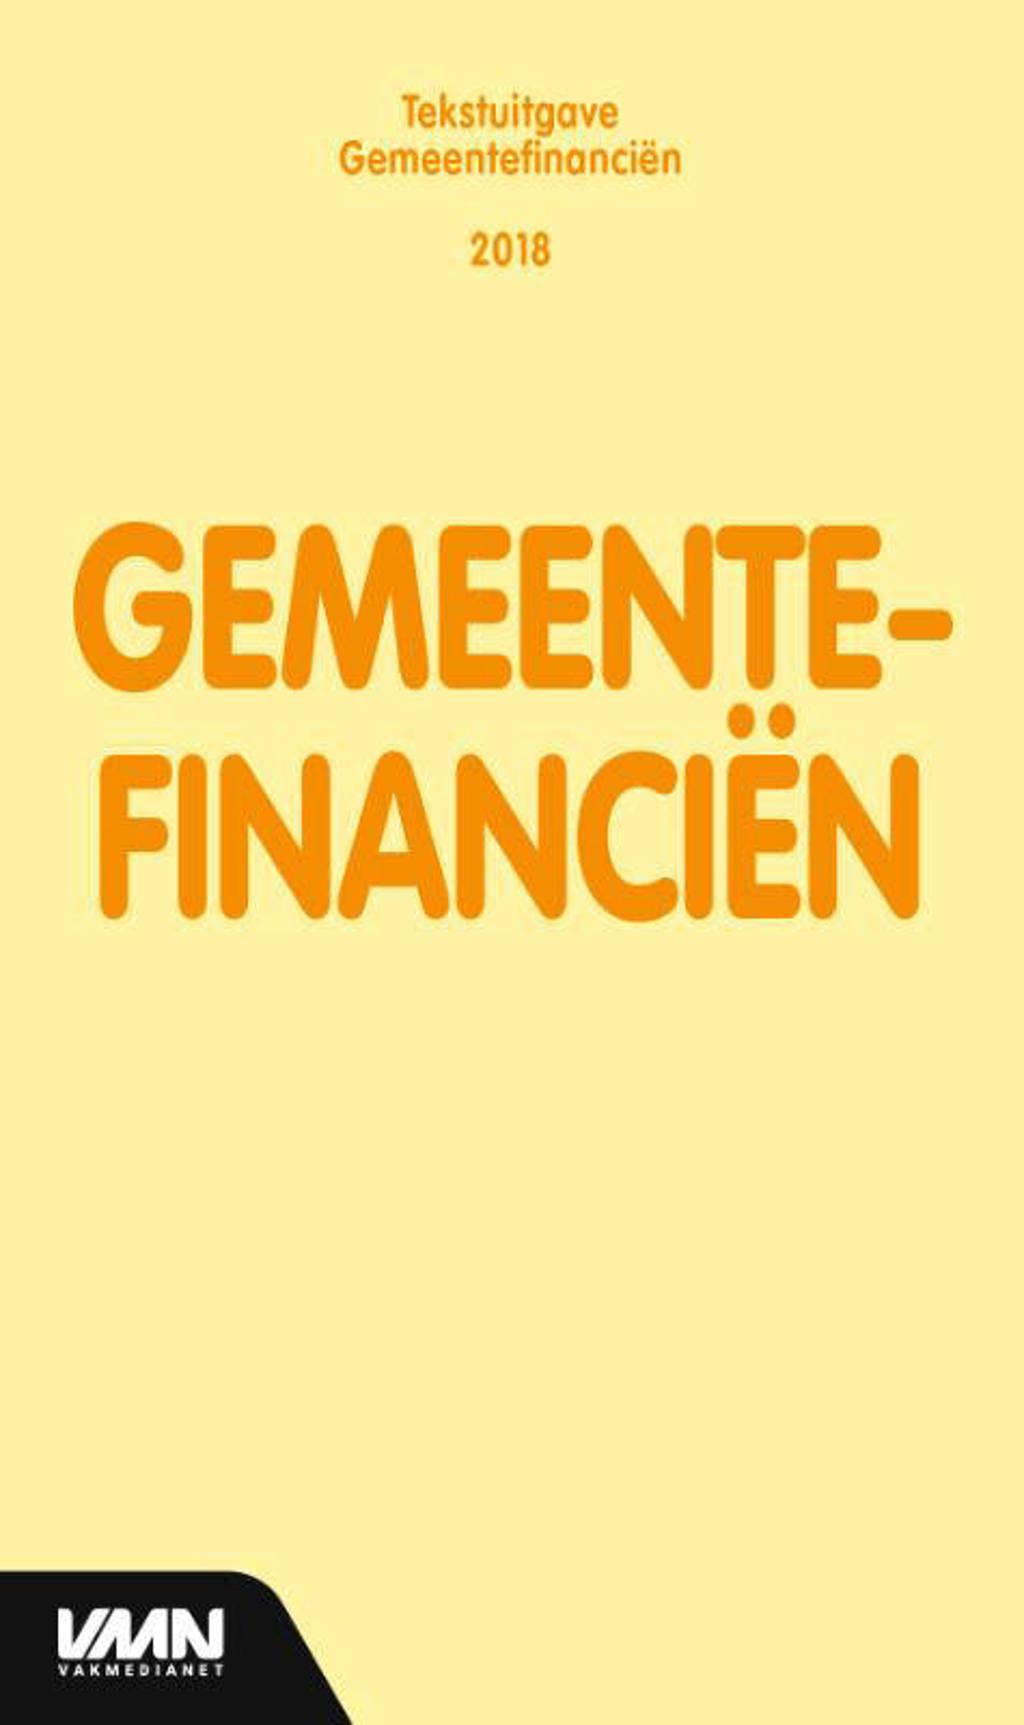 Tekstuitgave: Gemeentefinanciën 2018